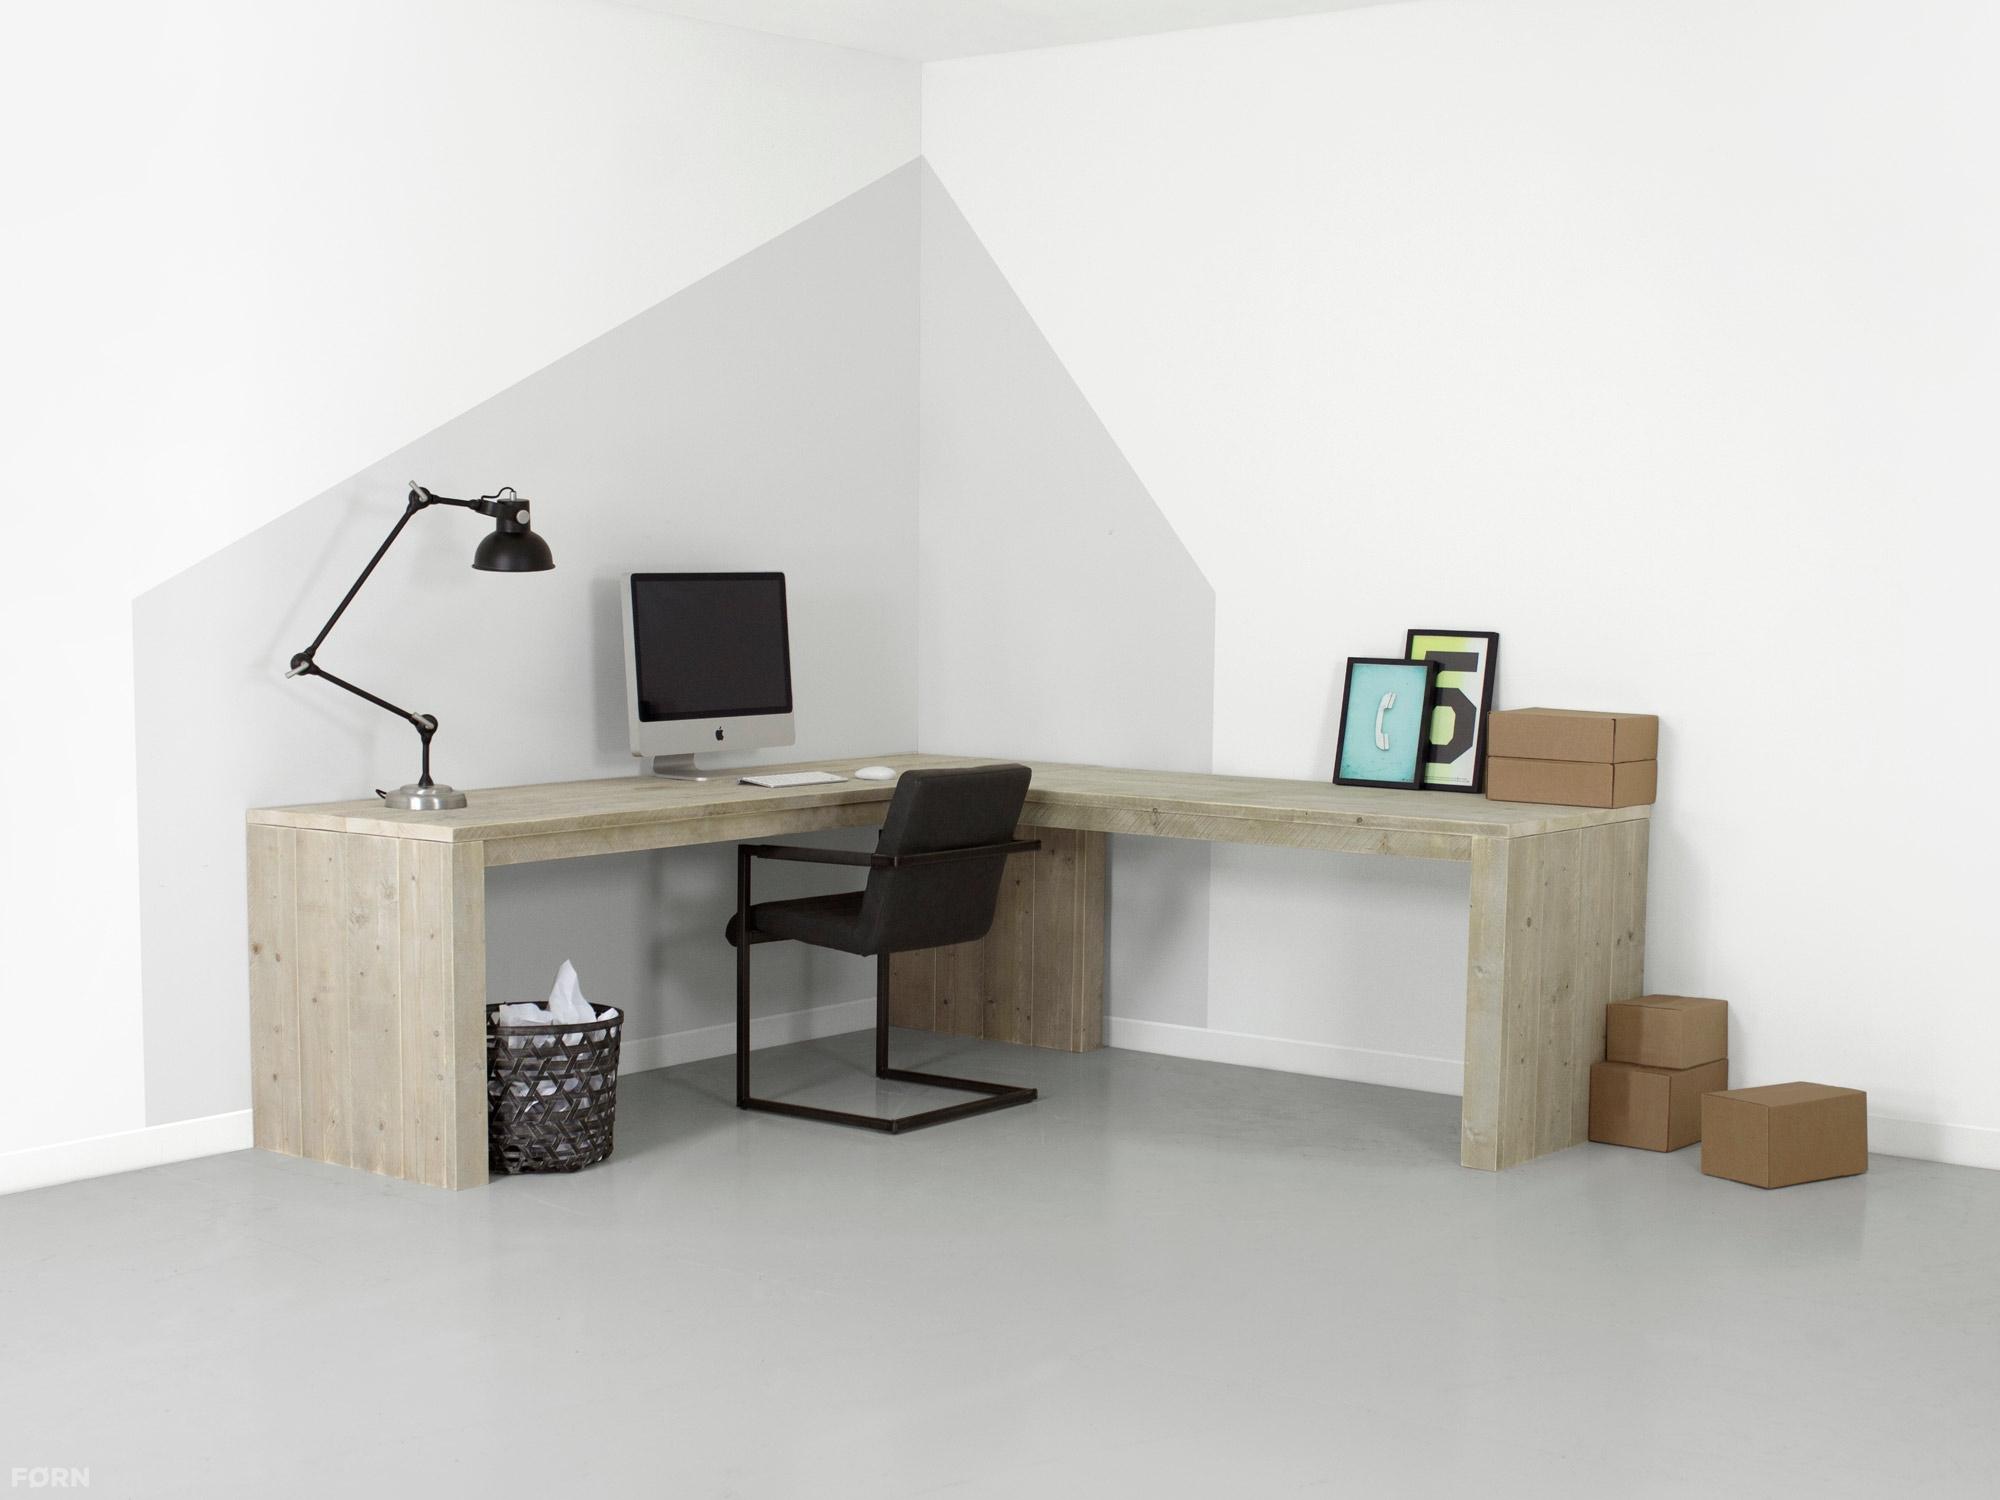 Steigerhouten meubelen kopen? steigerhoutenmeubelshop.nl